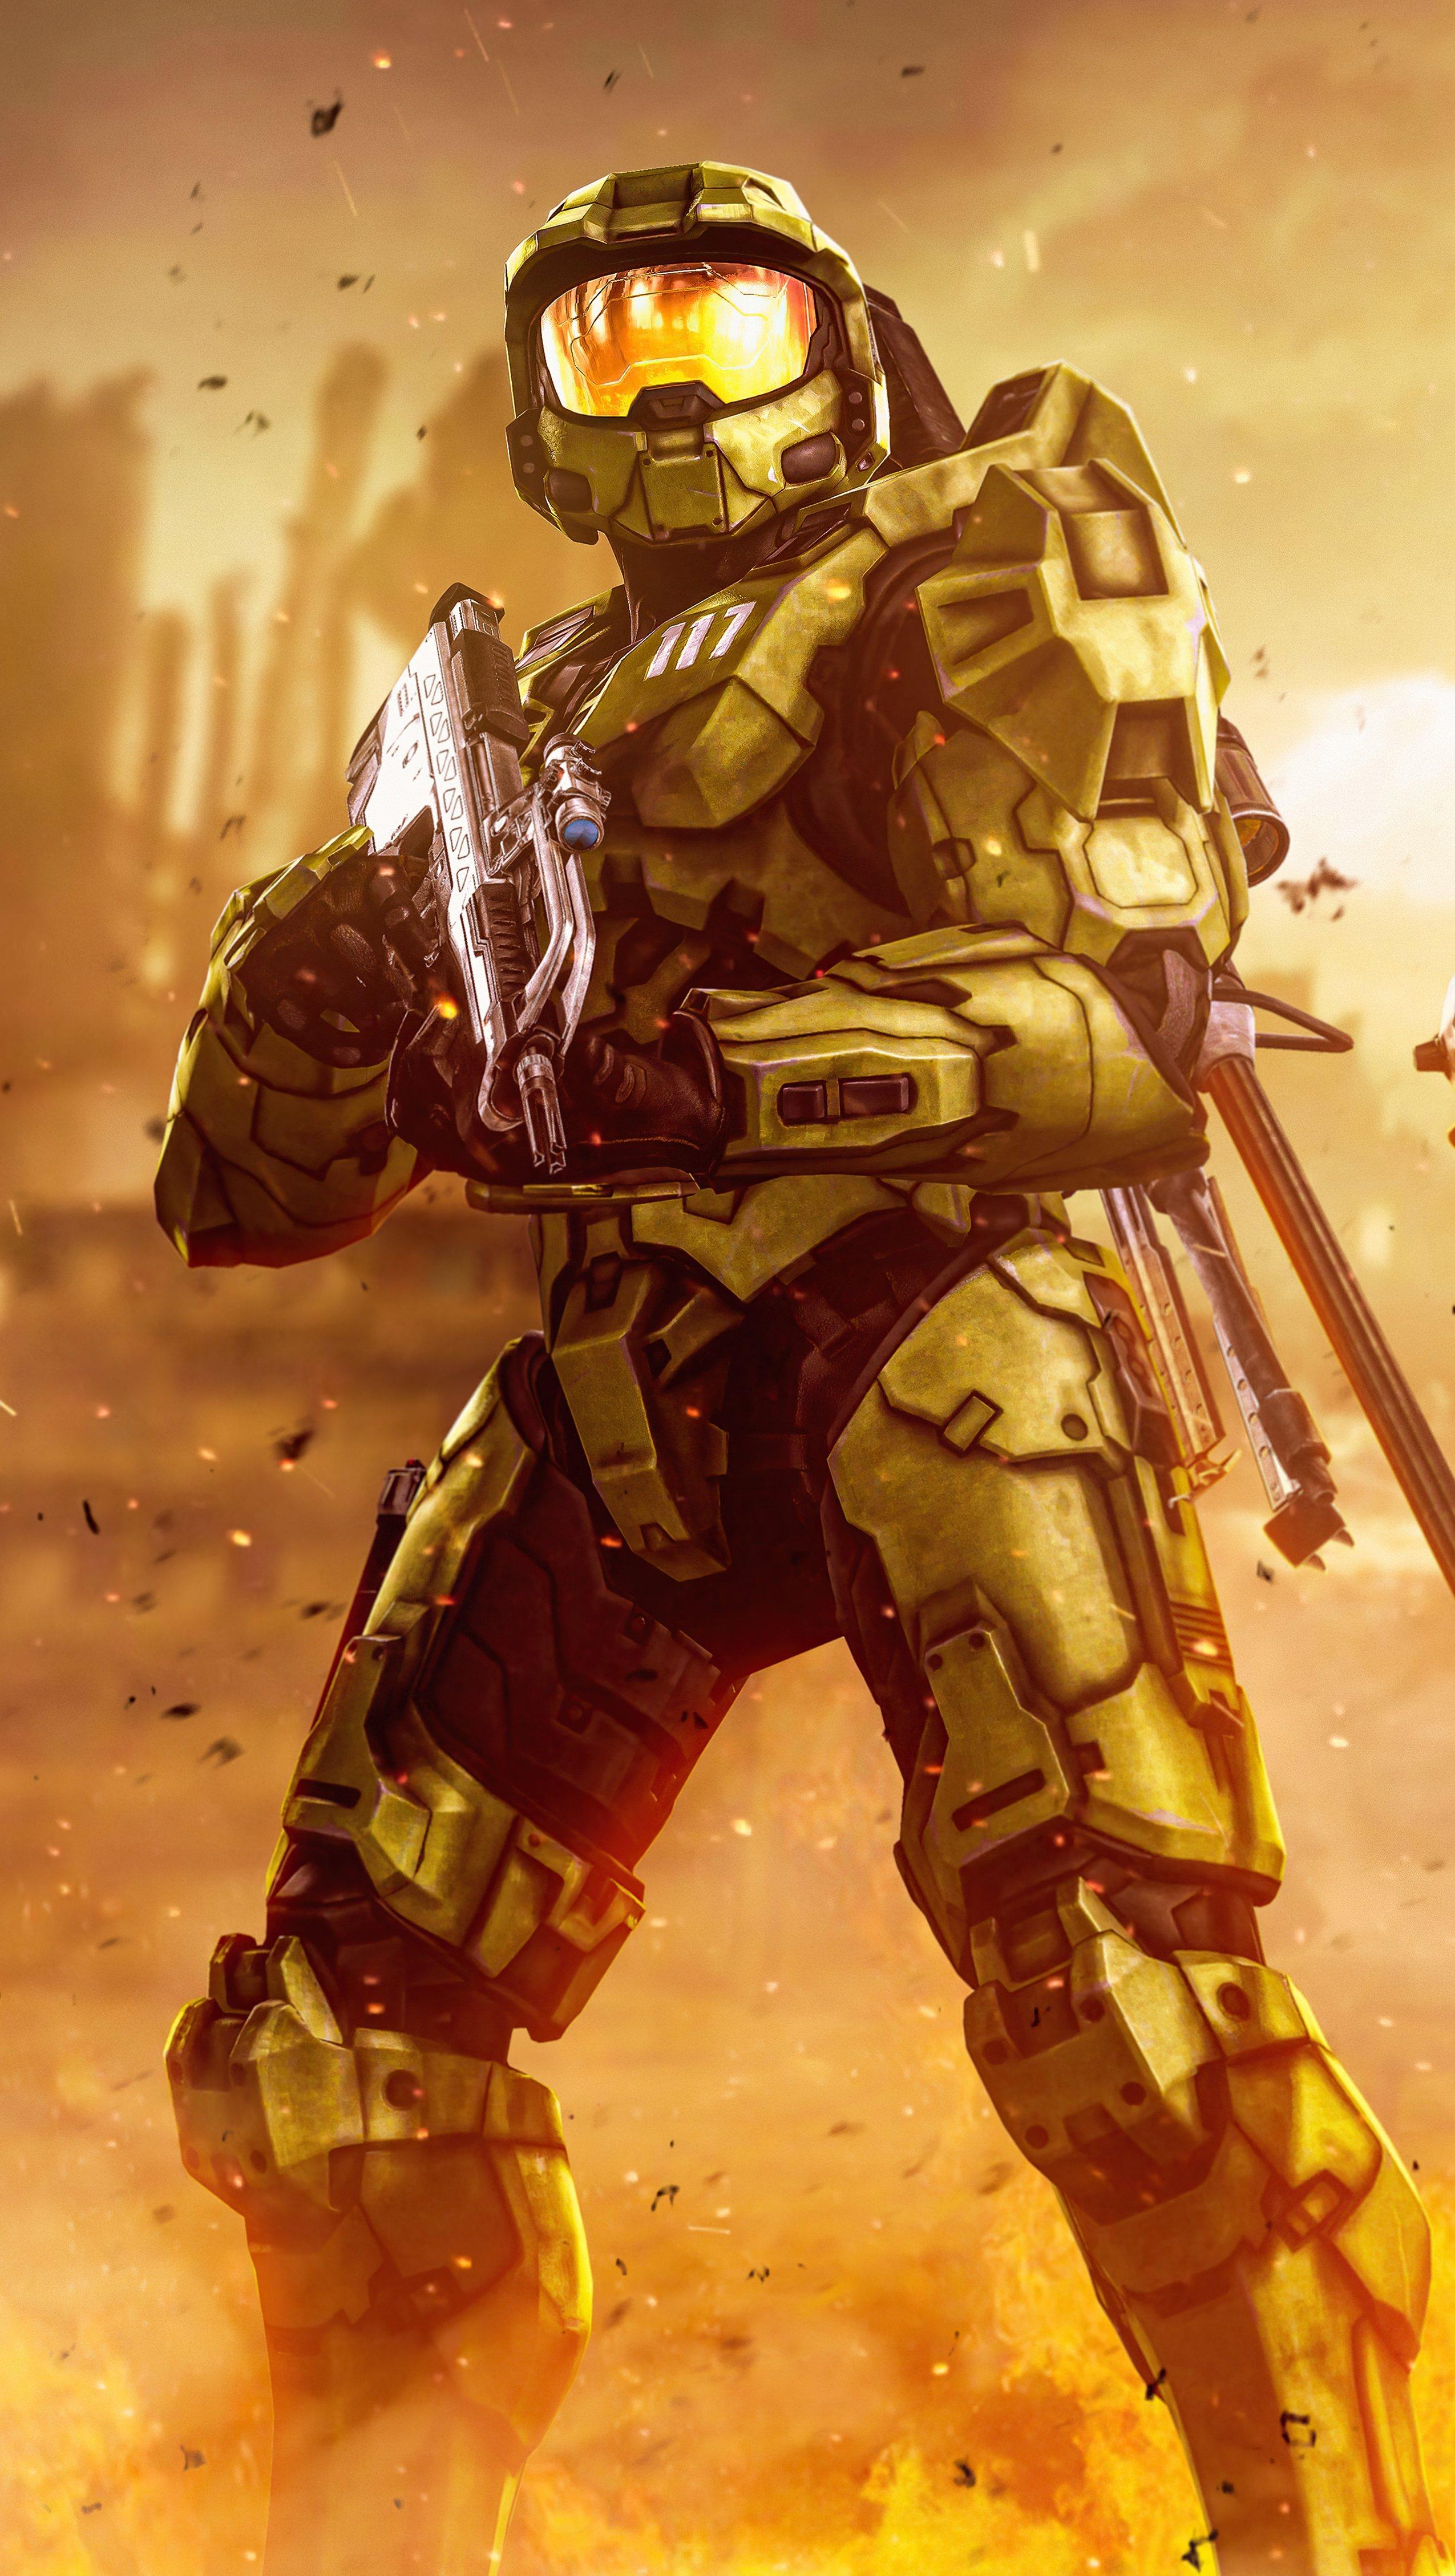 Fondos de pantalla Hombres verdes Halo Infinite Vertical